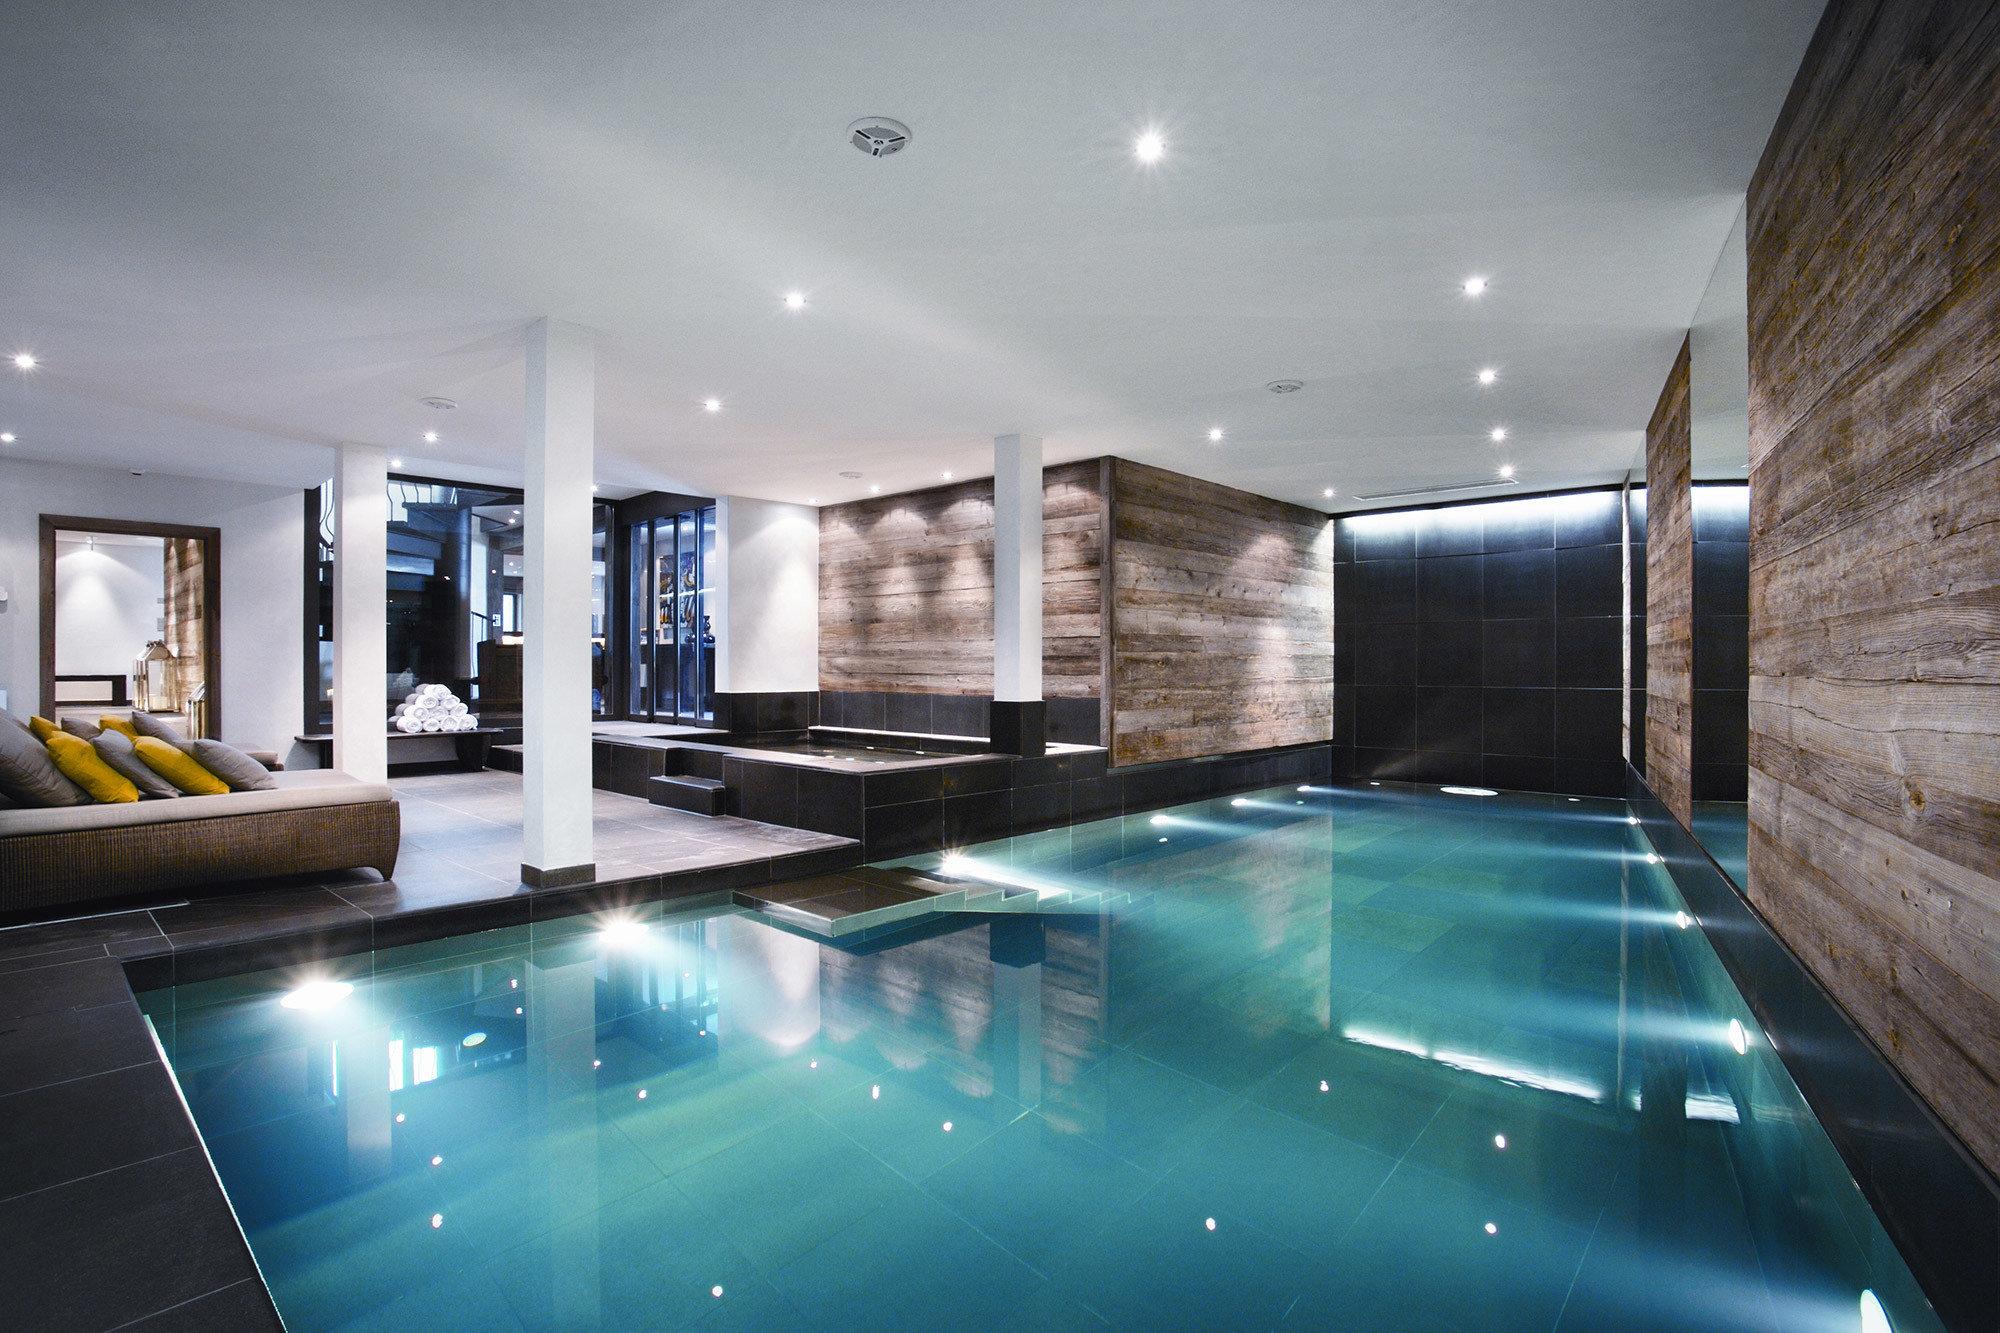 Hotels Luxury Travel Mountains + Skiing indoor ceiling wall floor swimming pool property room estate condominium interior design real estate mansion jacuzzi